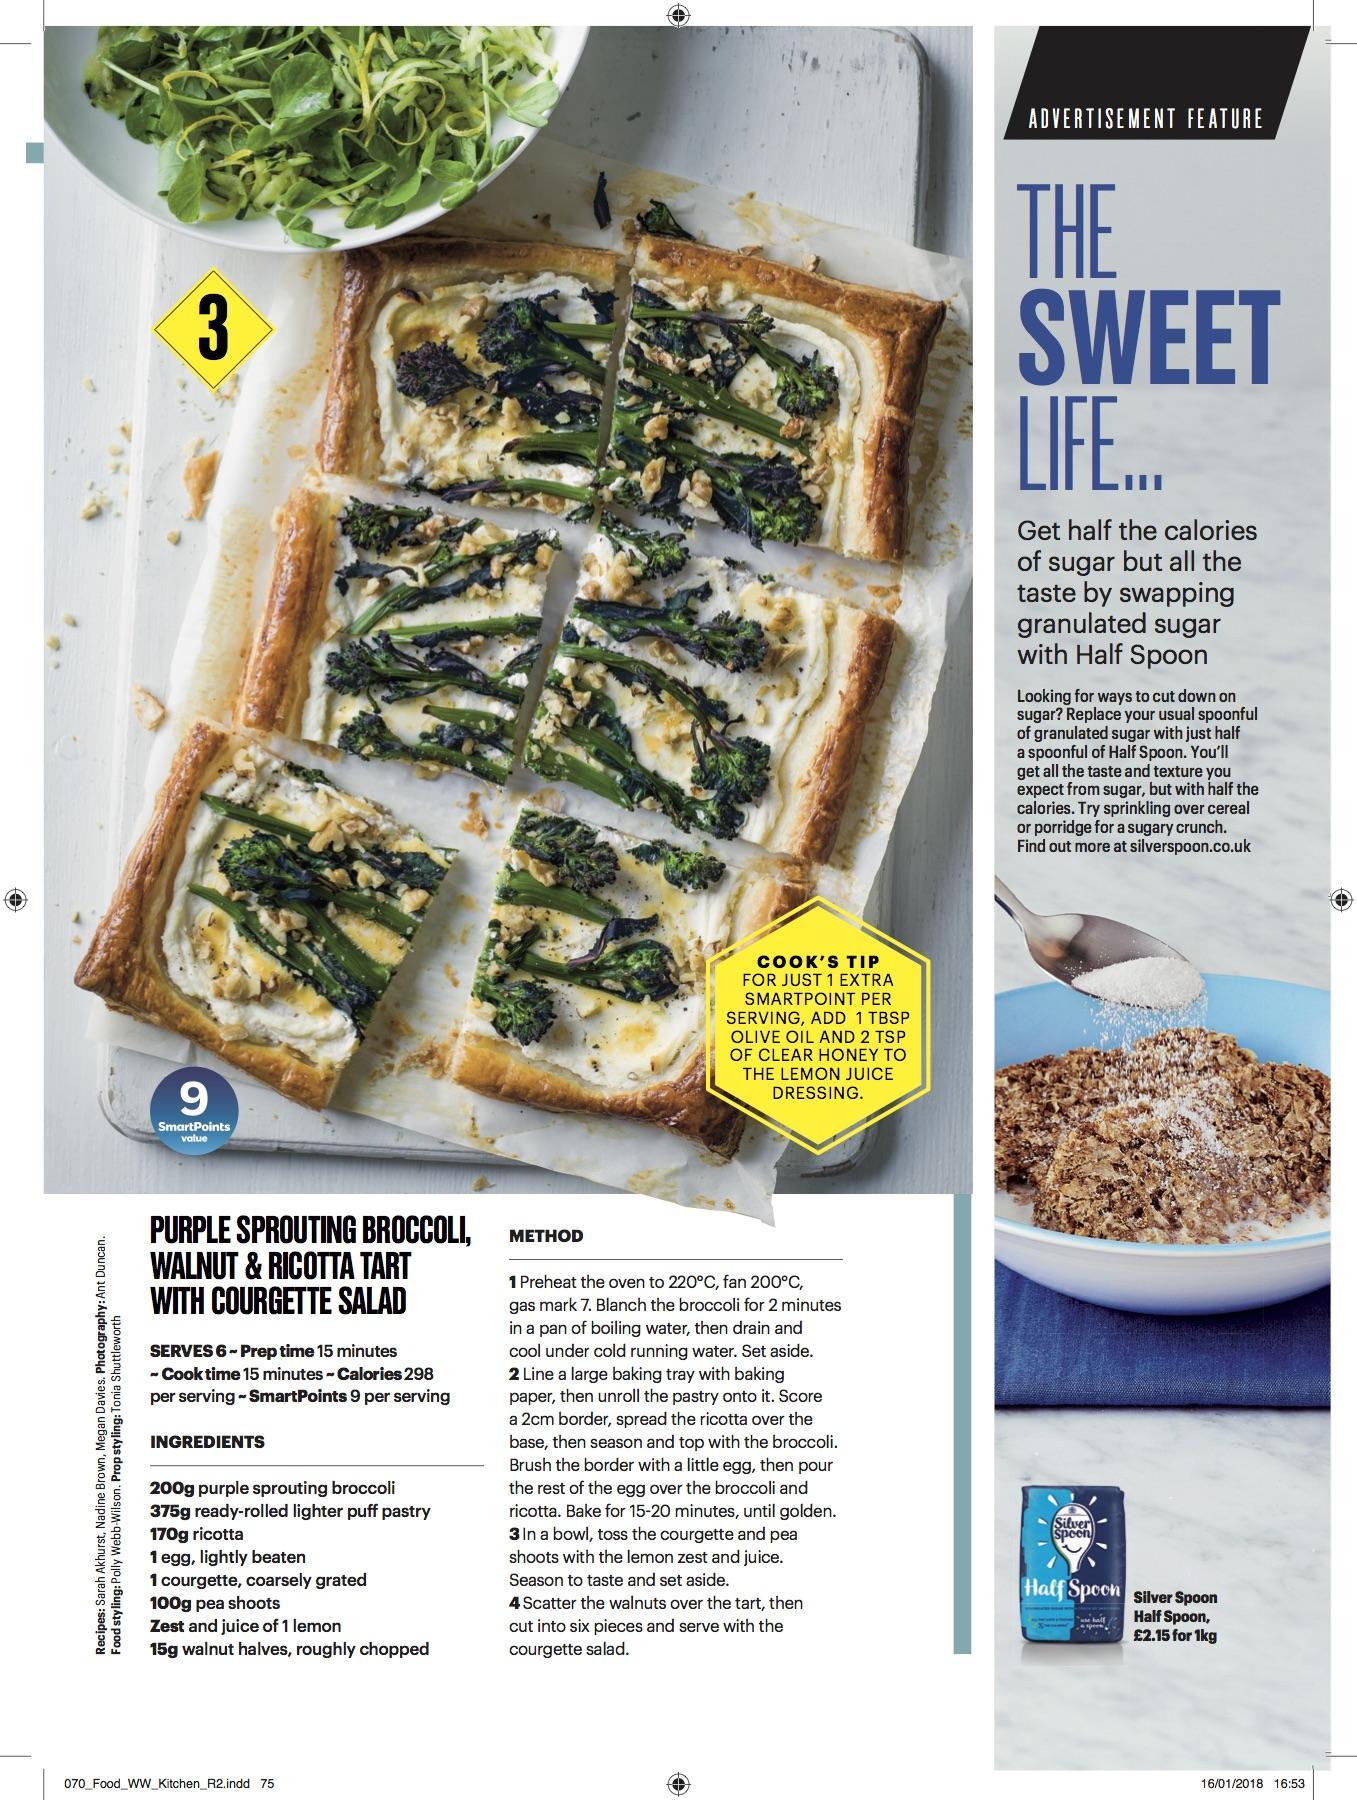 Publication: Weight Watchers magazine March 2018  Photographer: Ant Duncan  Food stylist: Polly Webb-Wilson  Prop stylist: Tonia Shuttleworth